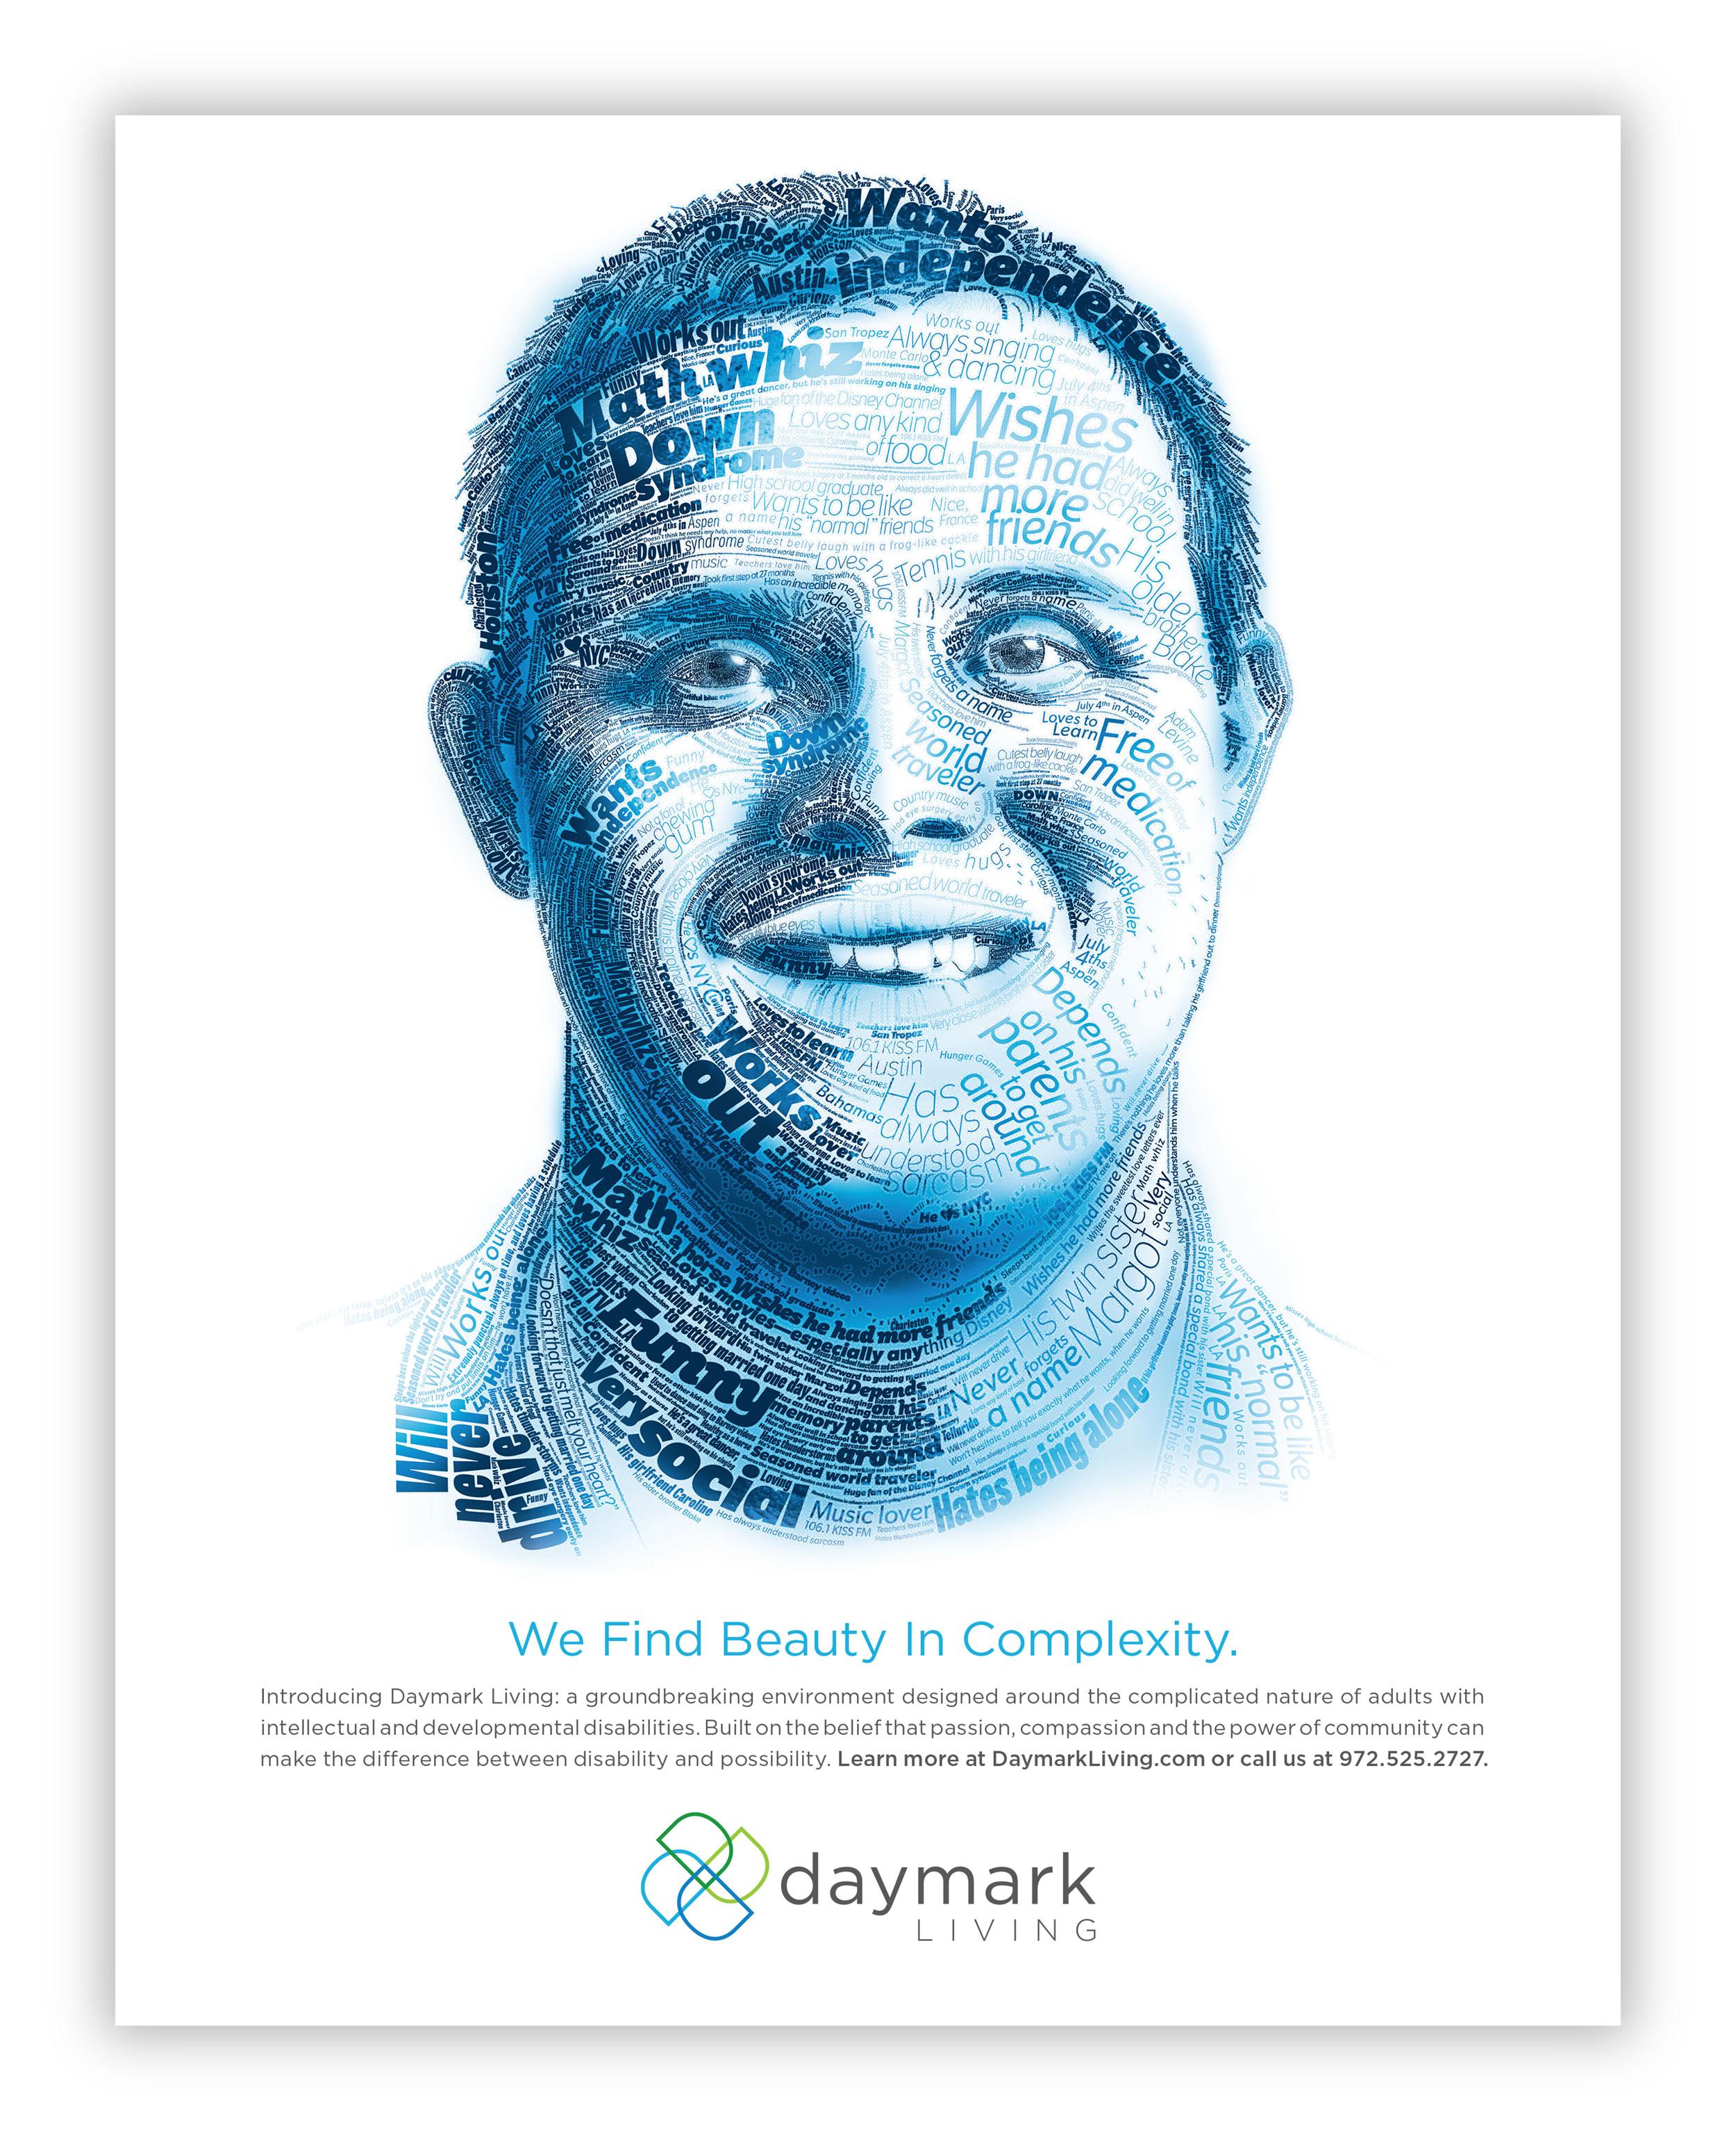 daymark-ads-michael.jpg